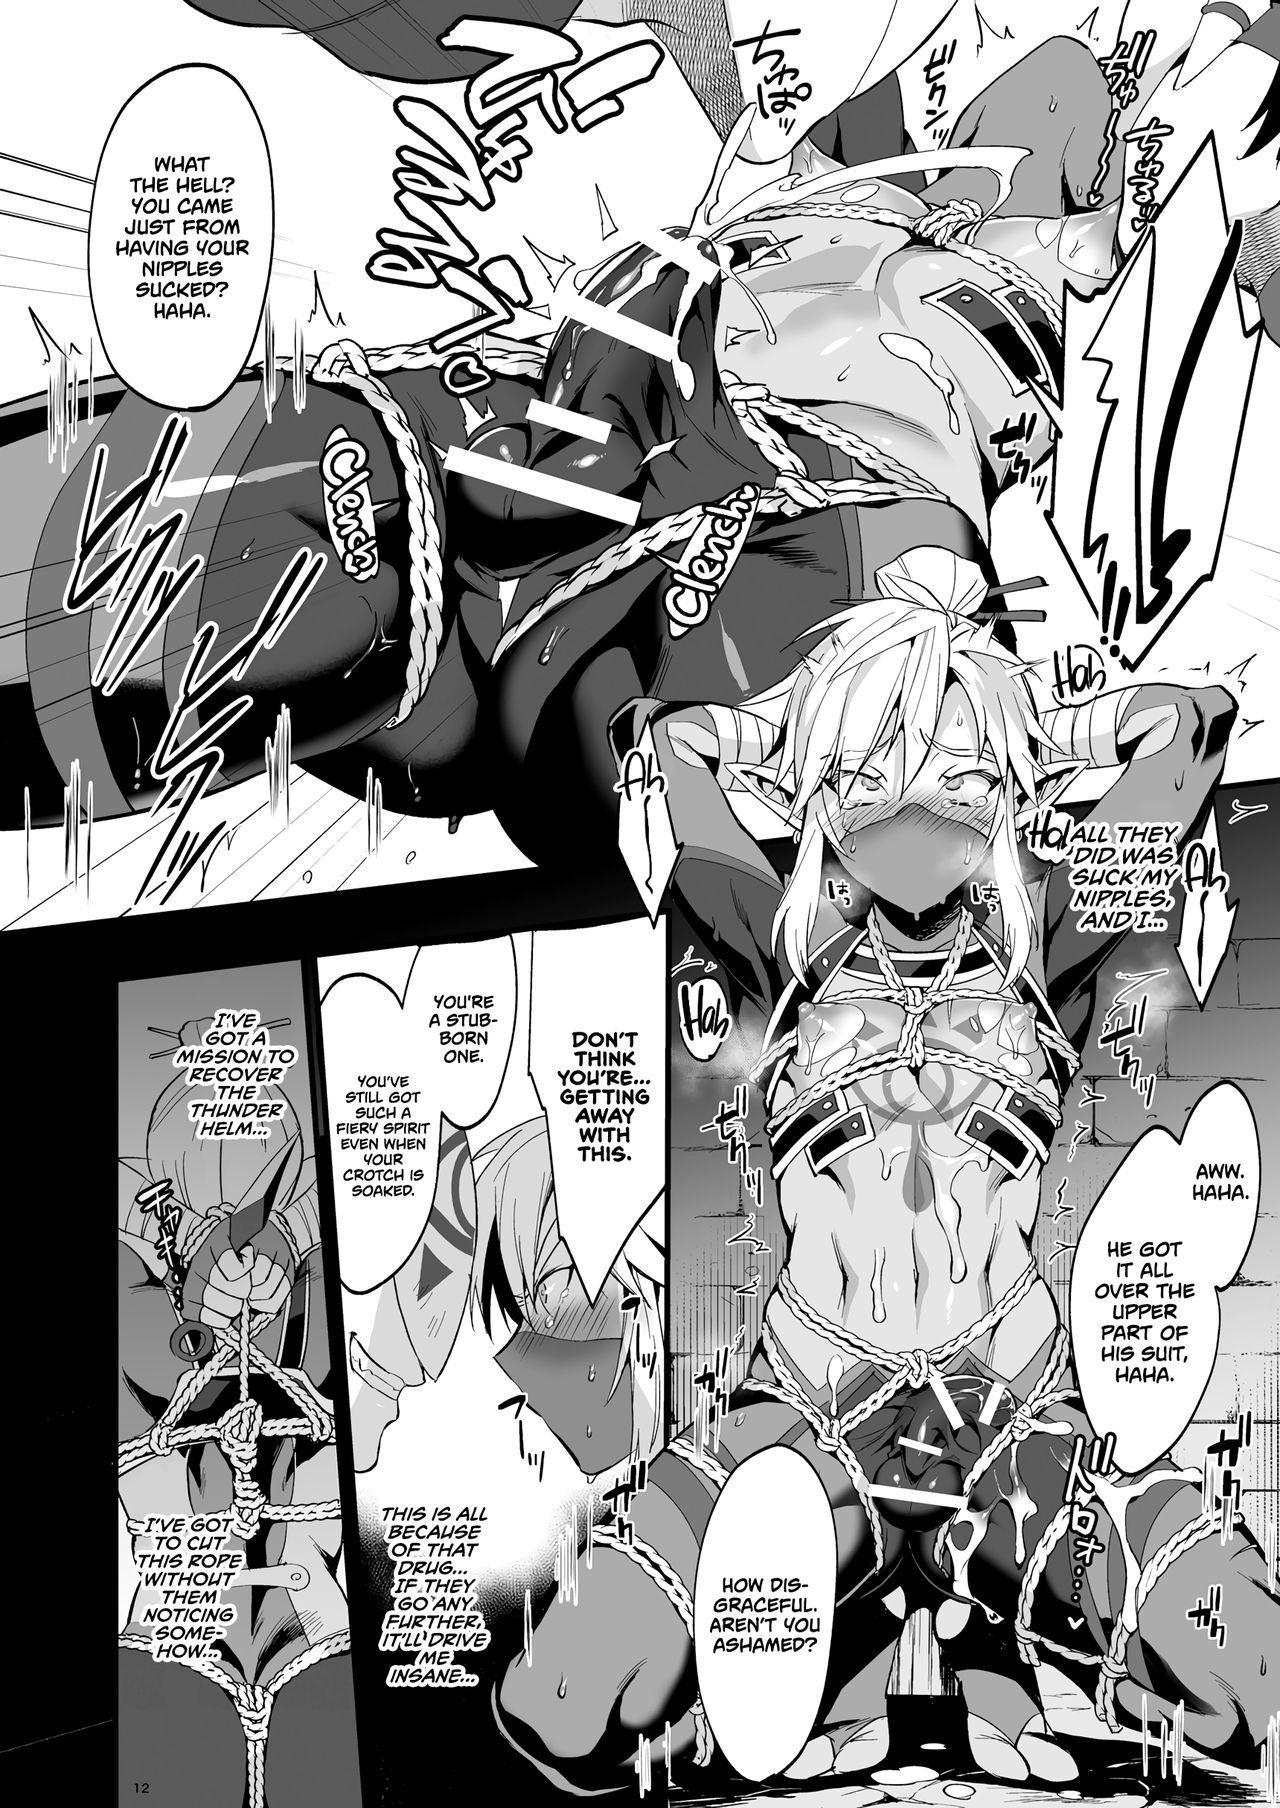 [Morittokoke (Morikoke)] Eiketsu Ninja Gaiden ~Haiboku Hen~ | The Champion's Ninja Side Story ~Failure~ (The Legend of Zelda) [English] =TLL + mrwayne= [Digital] 9